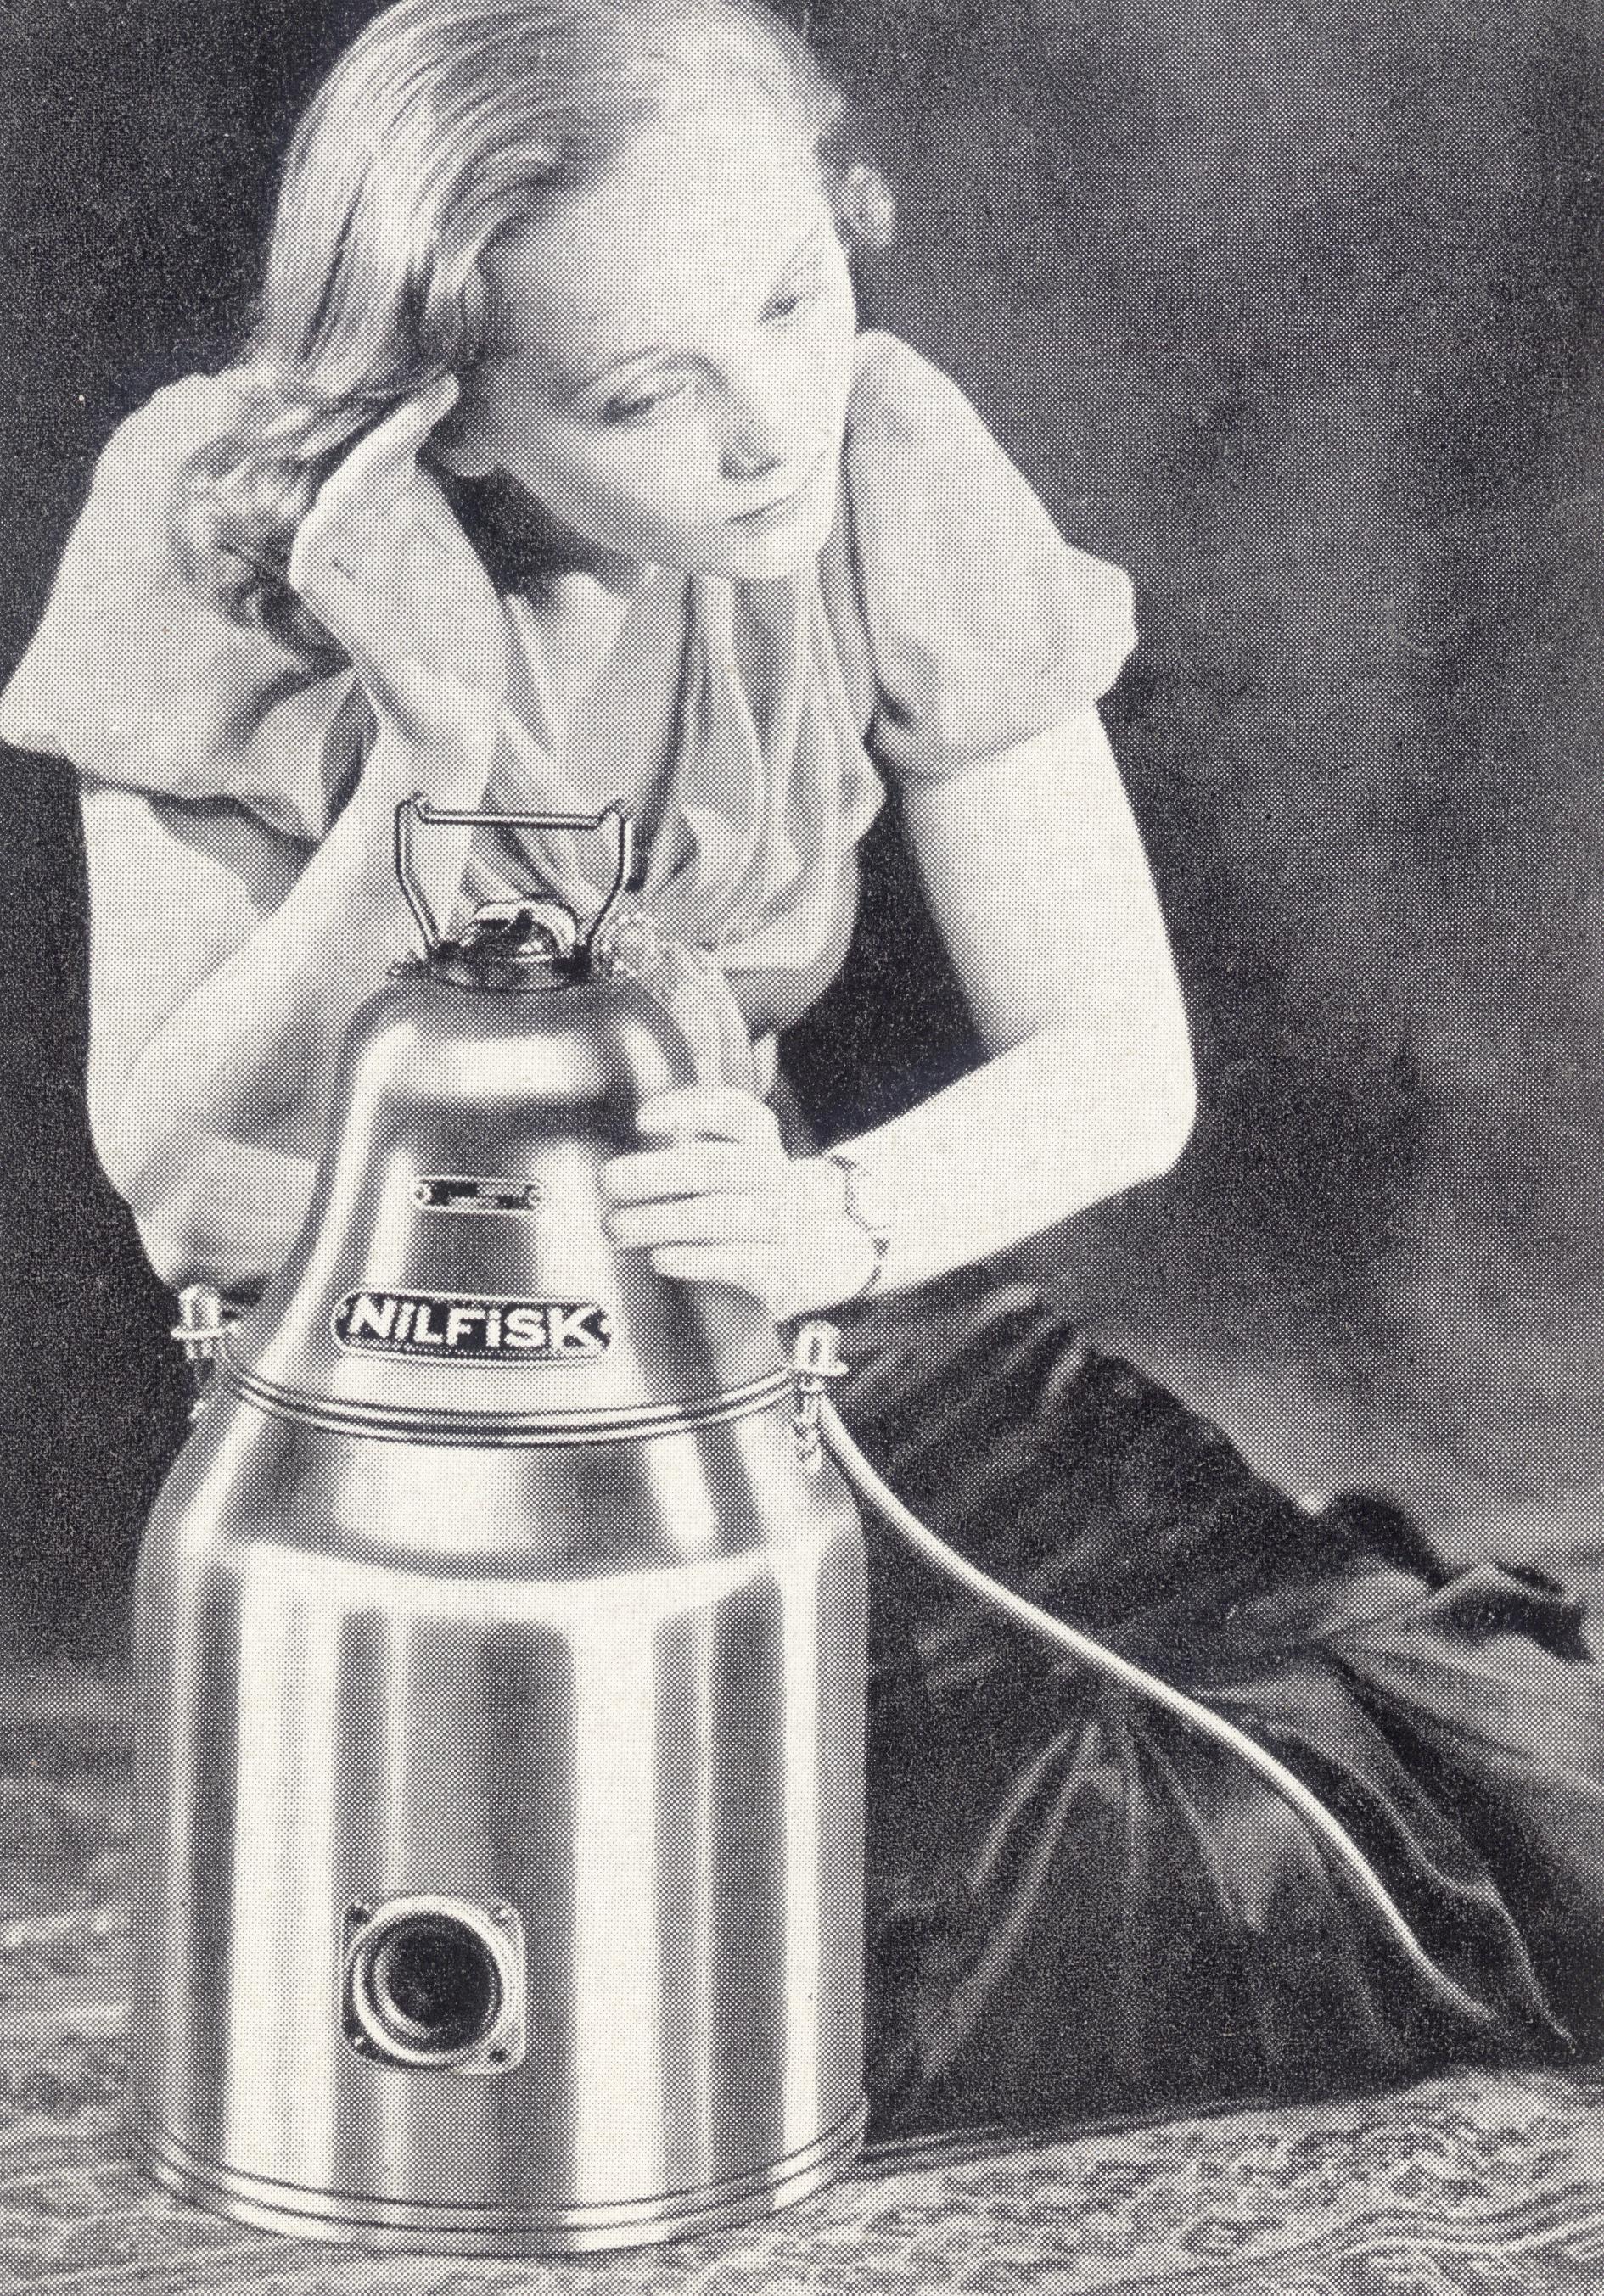 Thesilentdane1932